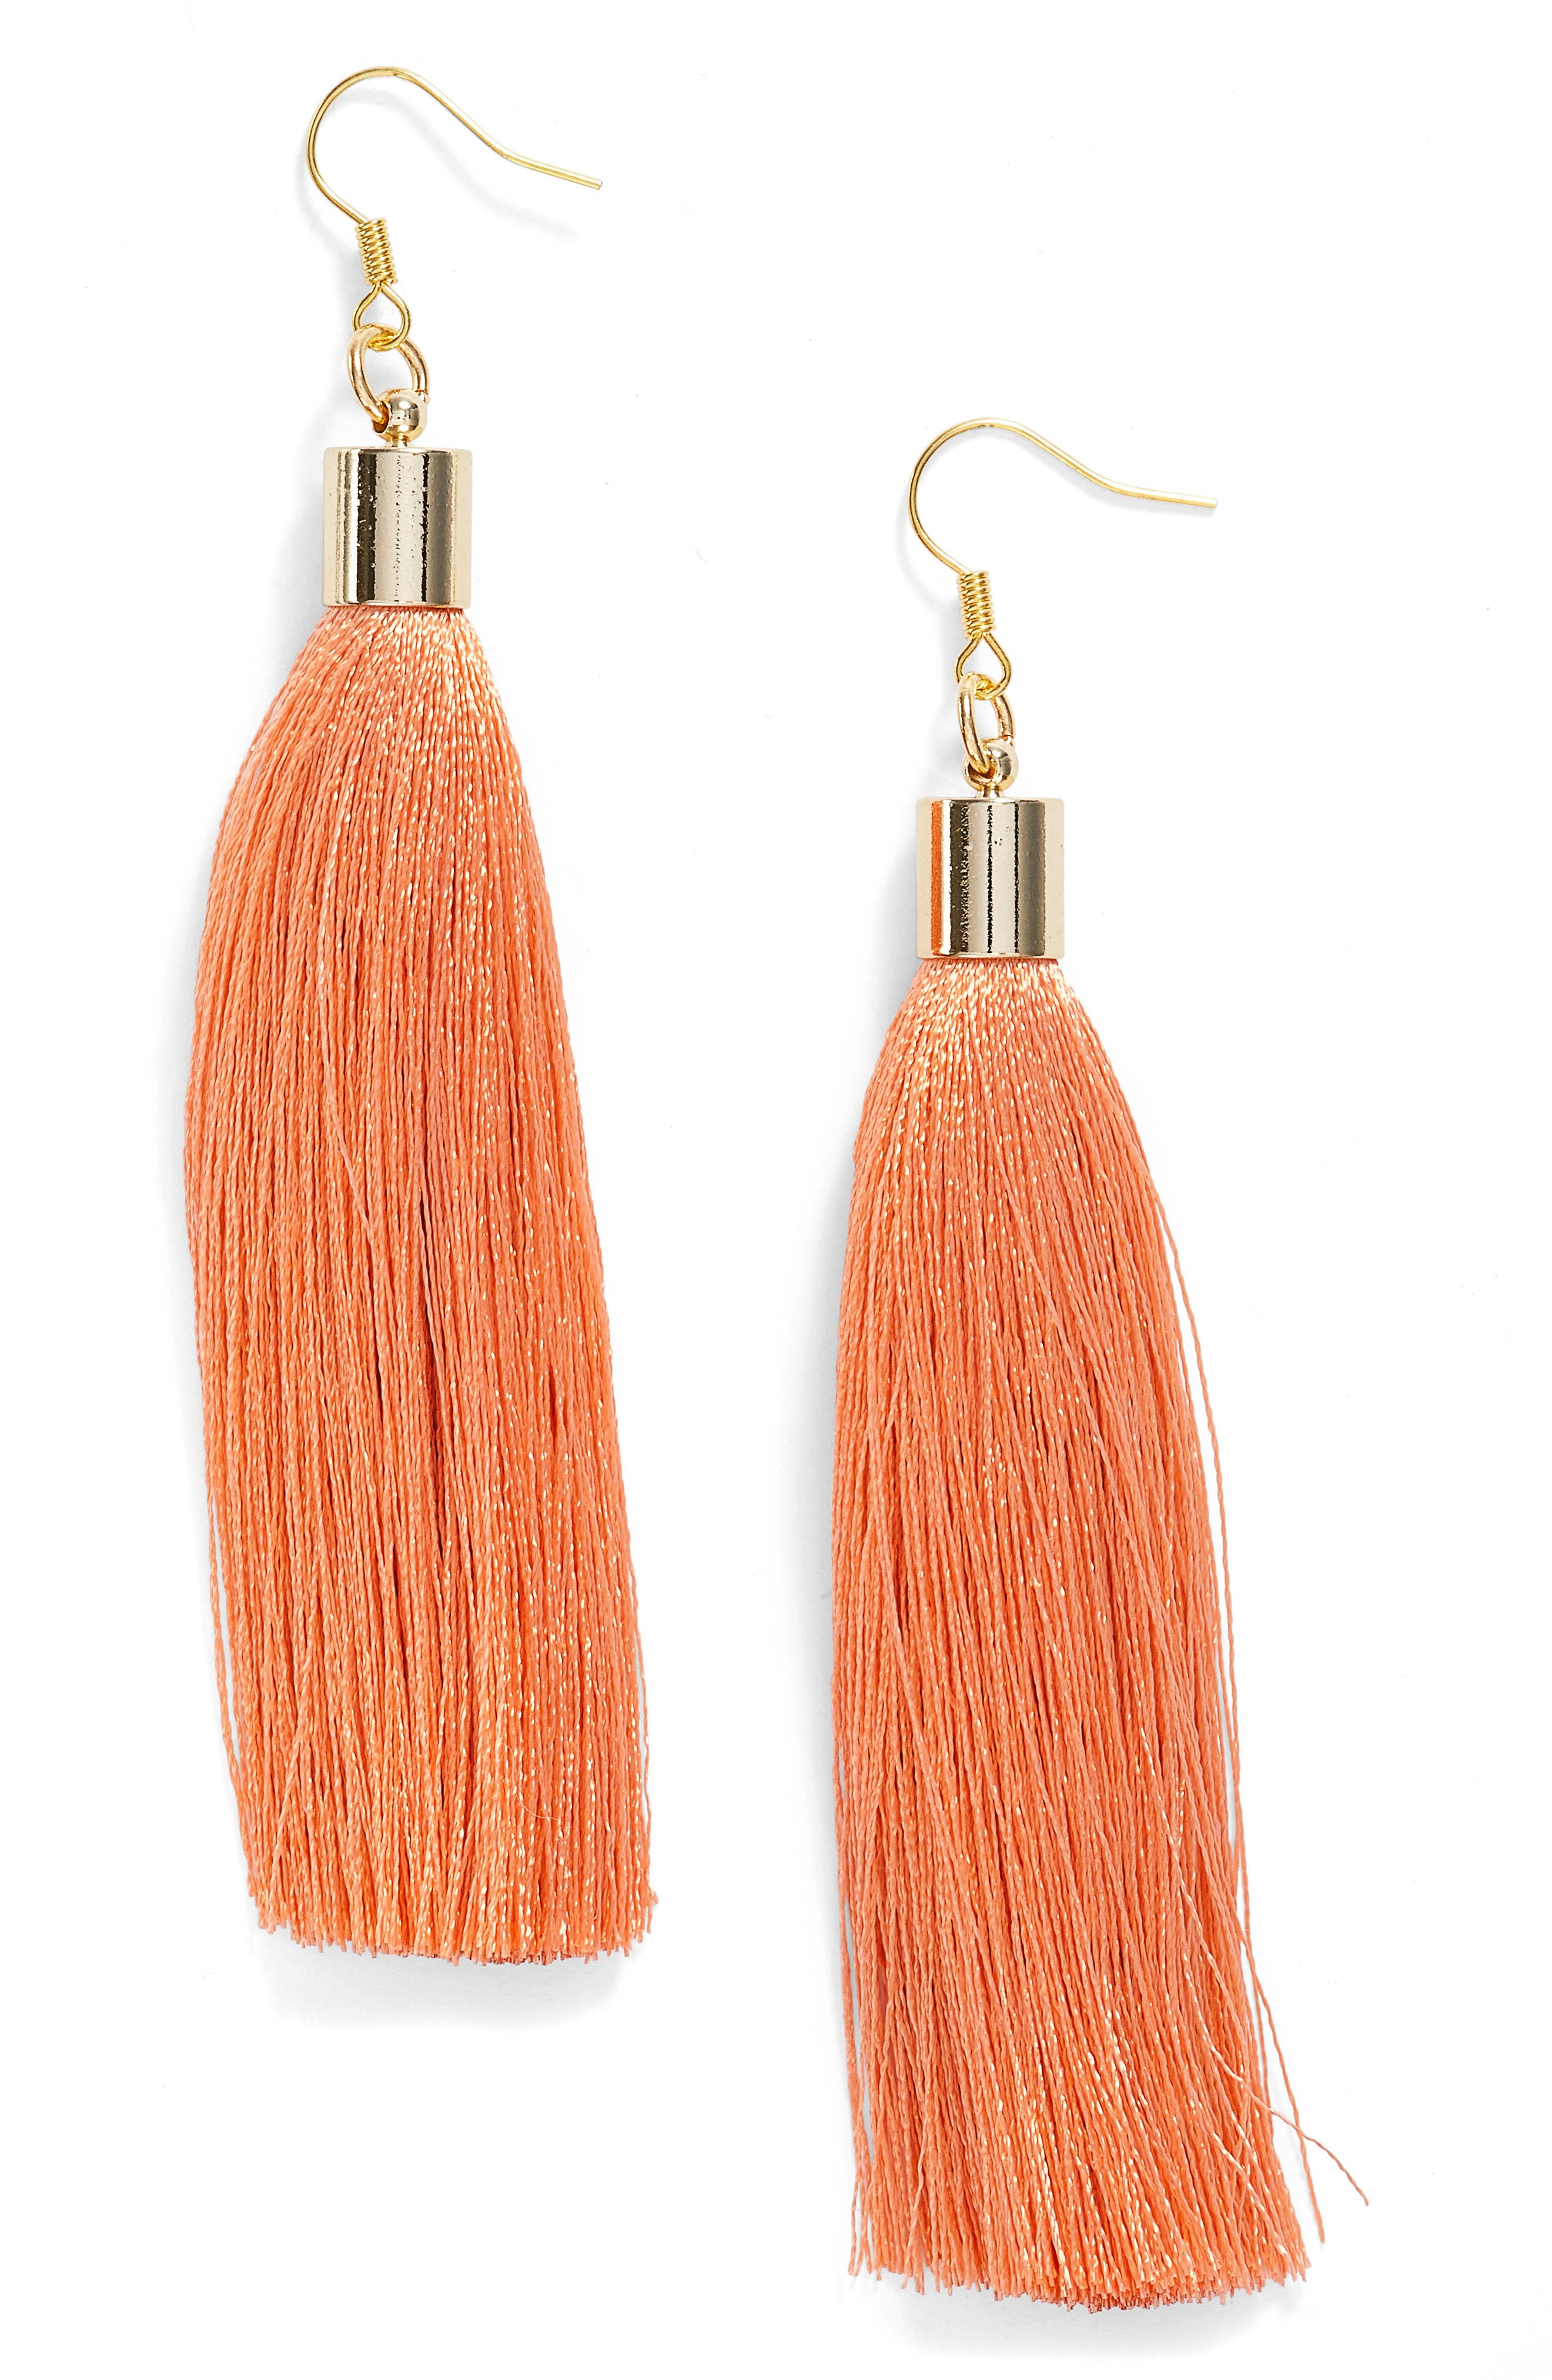 Main Image - Love's Affect Silk Tassel Earrings